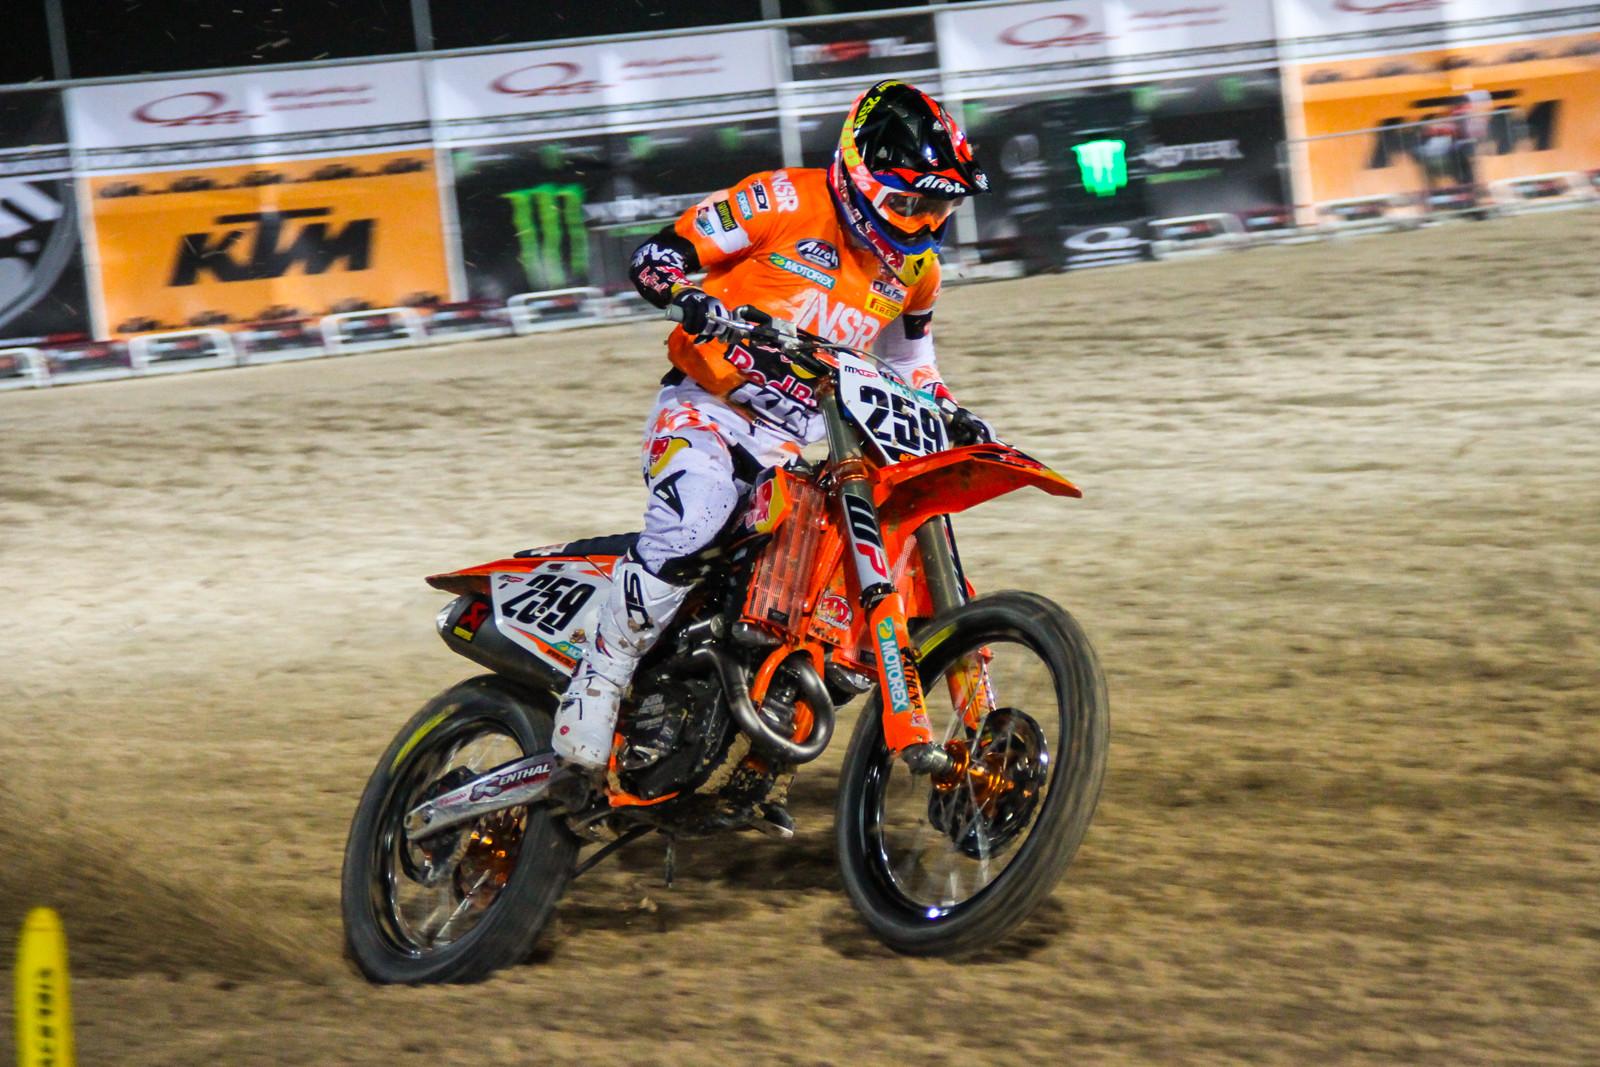 Glenn Coldenhoff - Photo Blast: 2017 MXGP of Qatar - Motocross Pictures - Vital MX